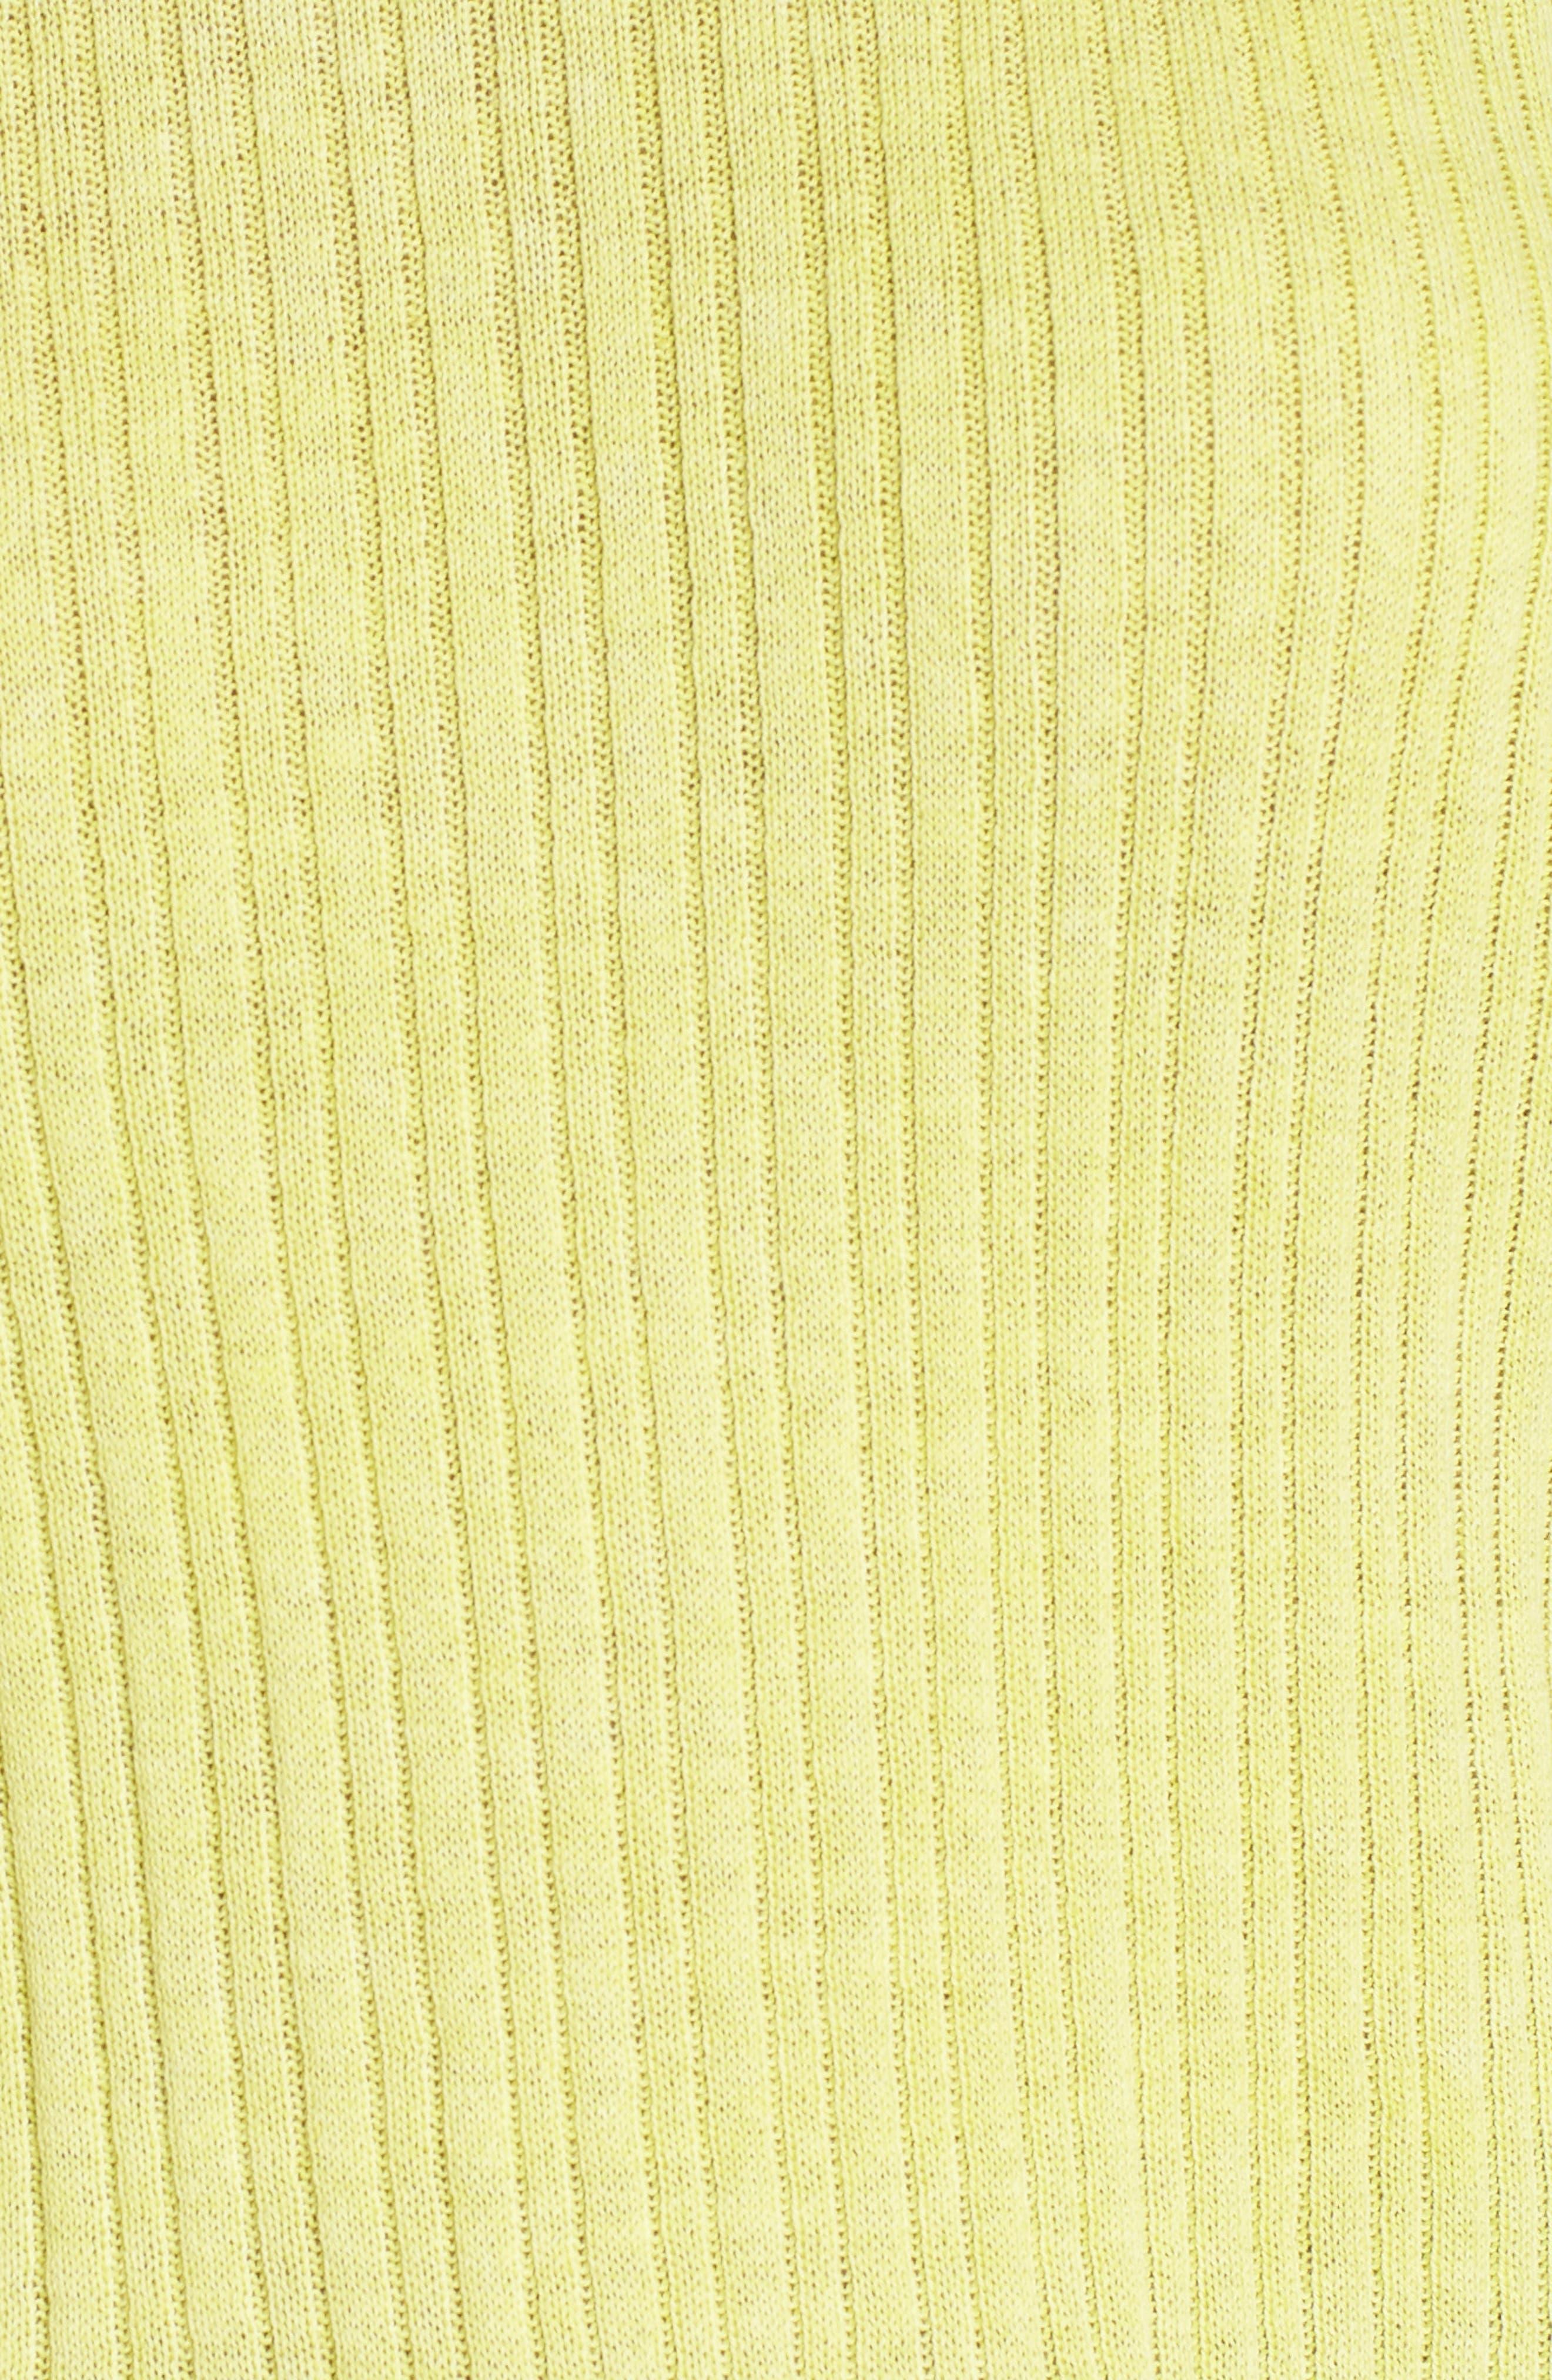 Crewneck Variegated Rib-Knit Sweater,                             Alternate thumbnail 15, color,